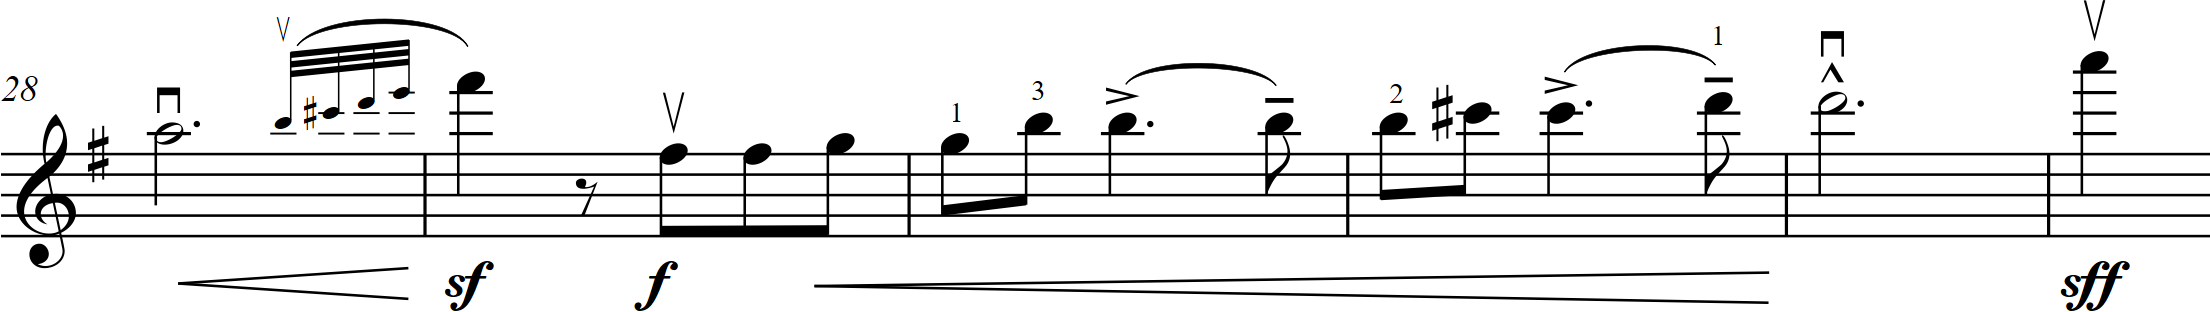 G7 Coleridge-Taylor - Valse Mauresque - 28-33 vln